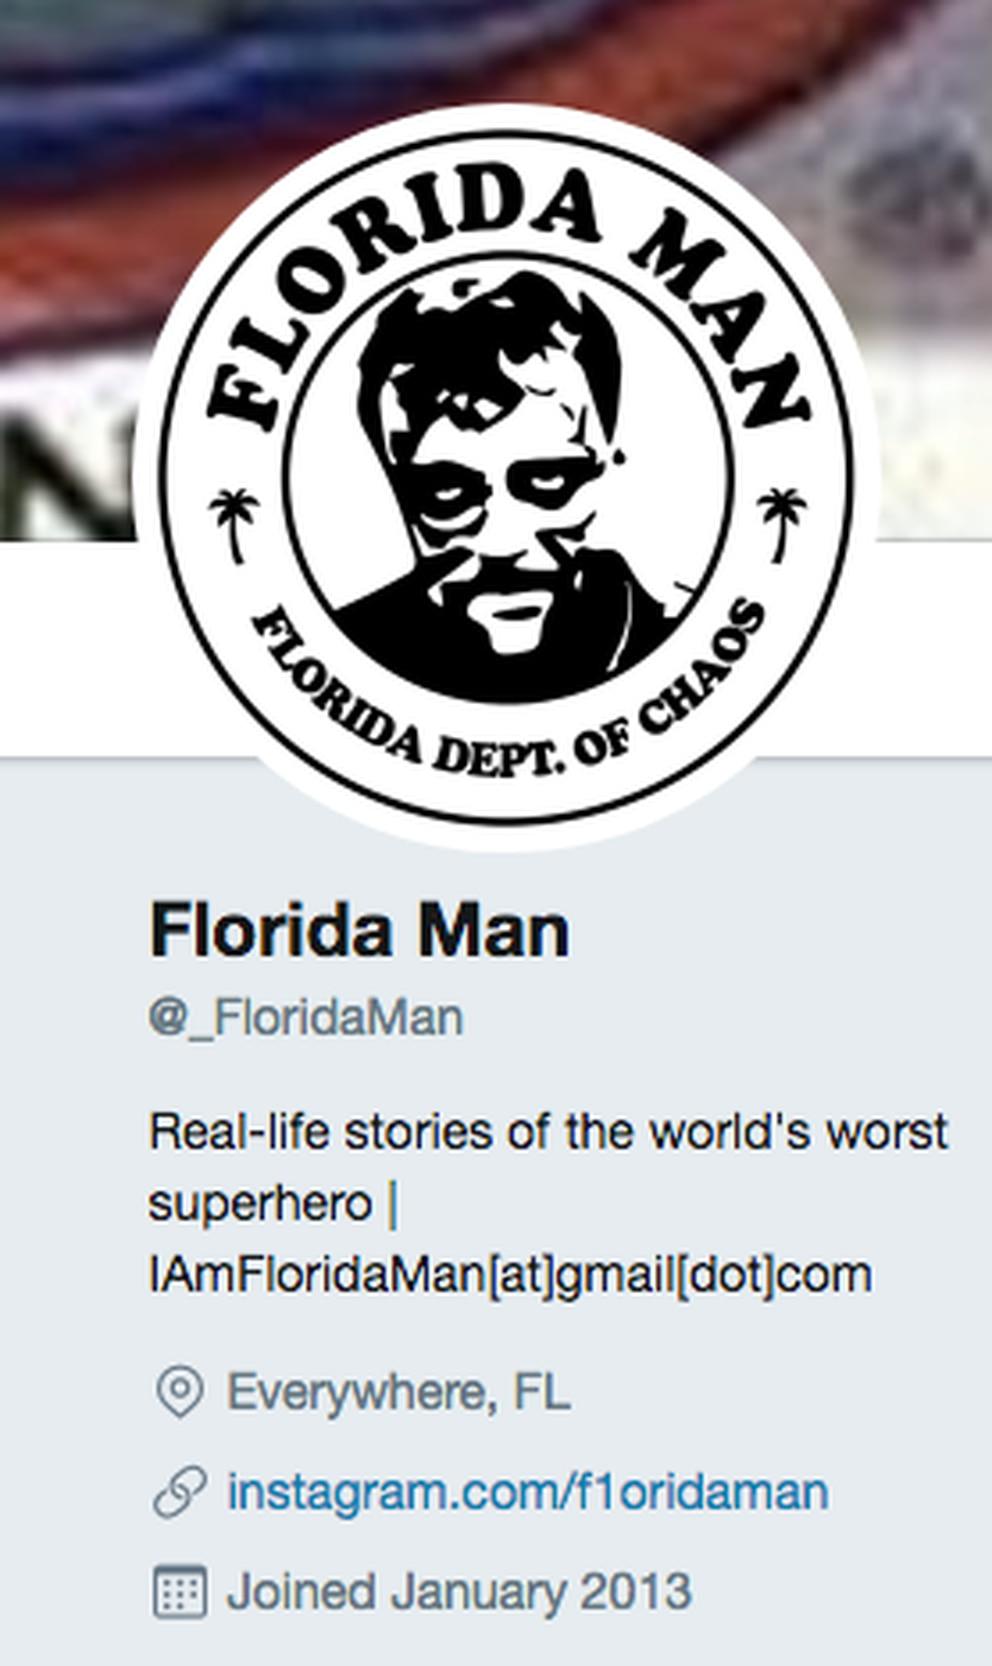 Screenshoot of the Florida Man Twitter account.